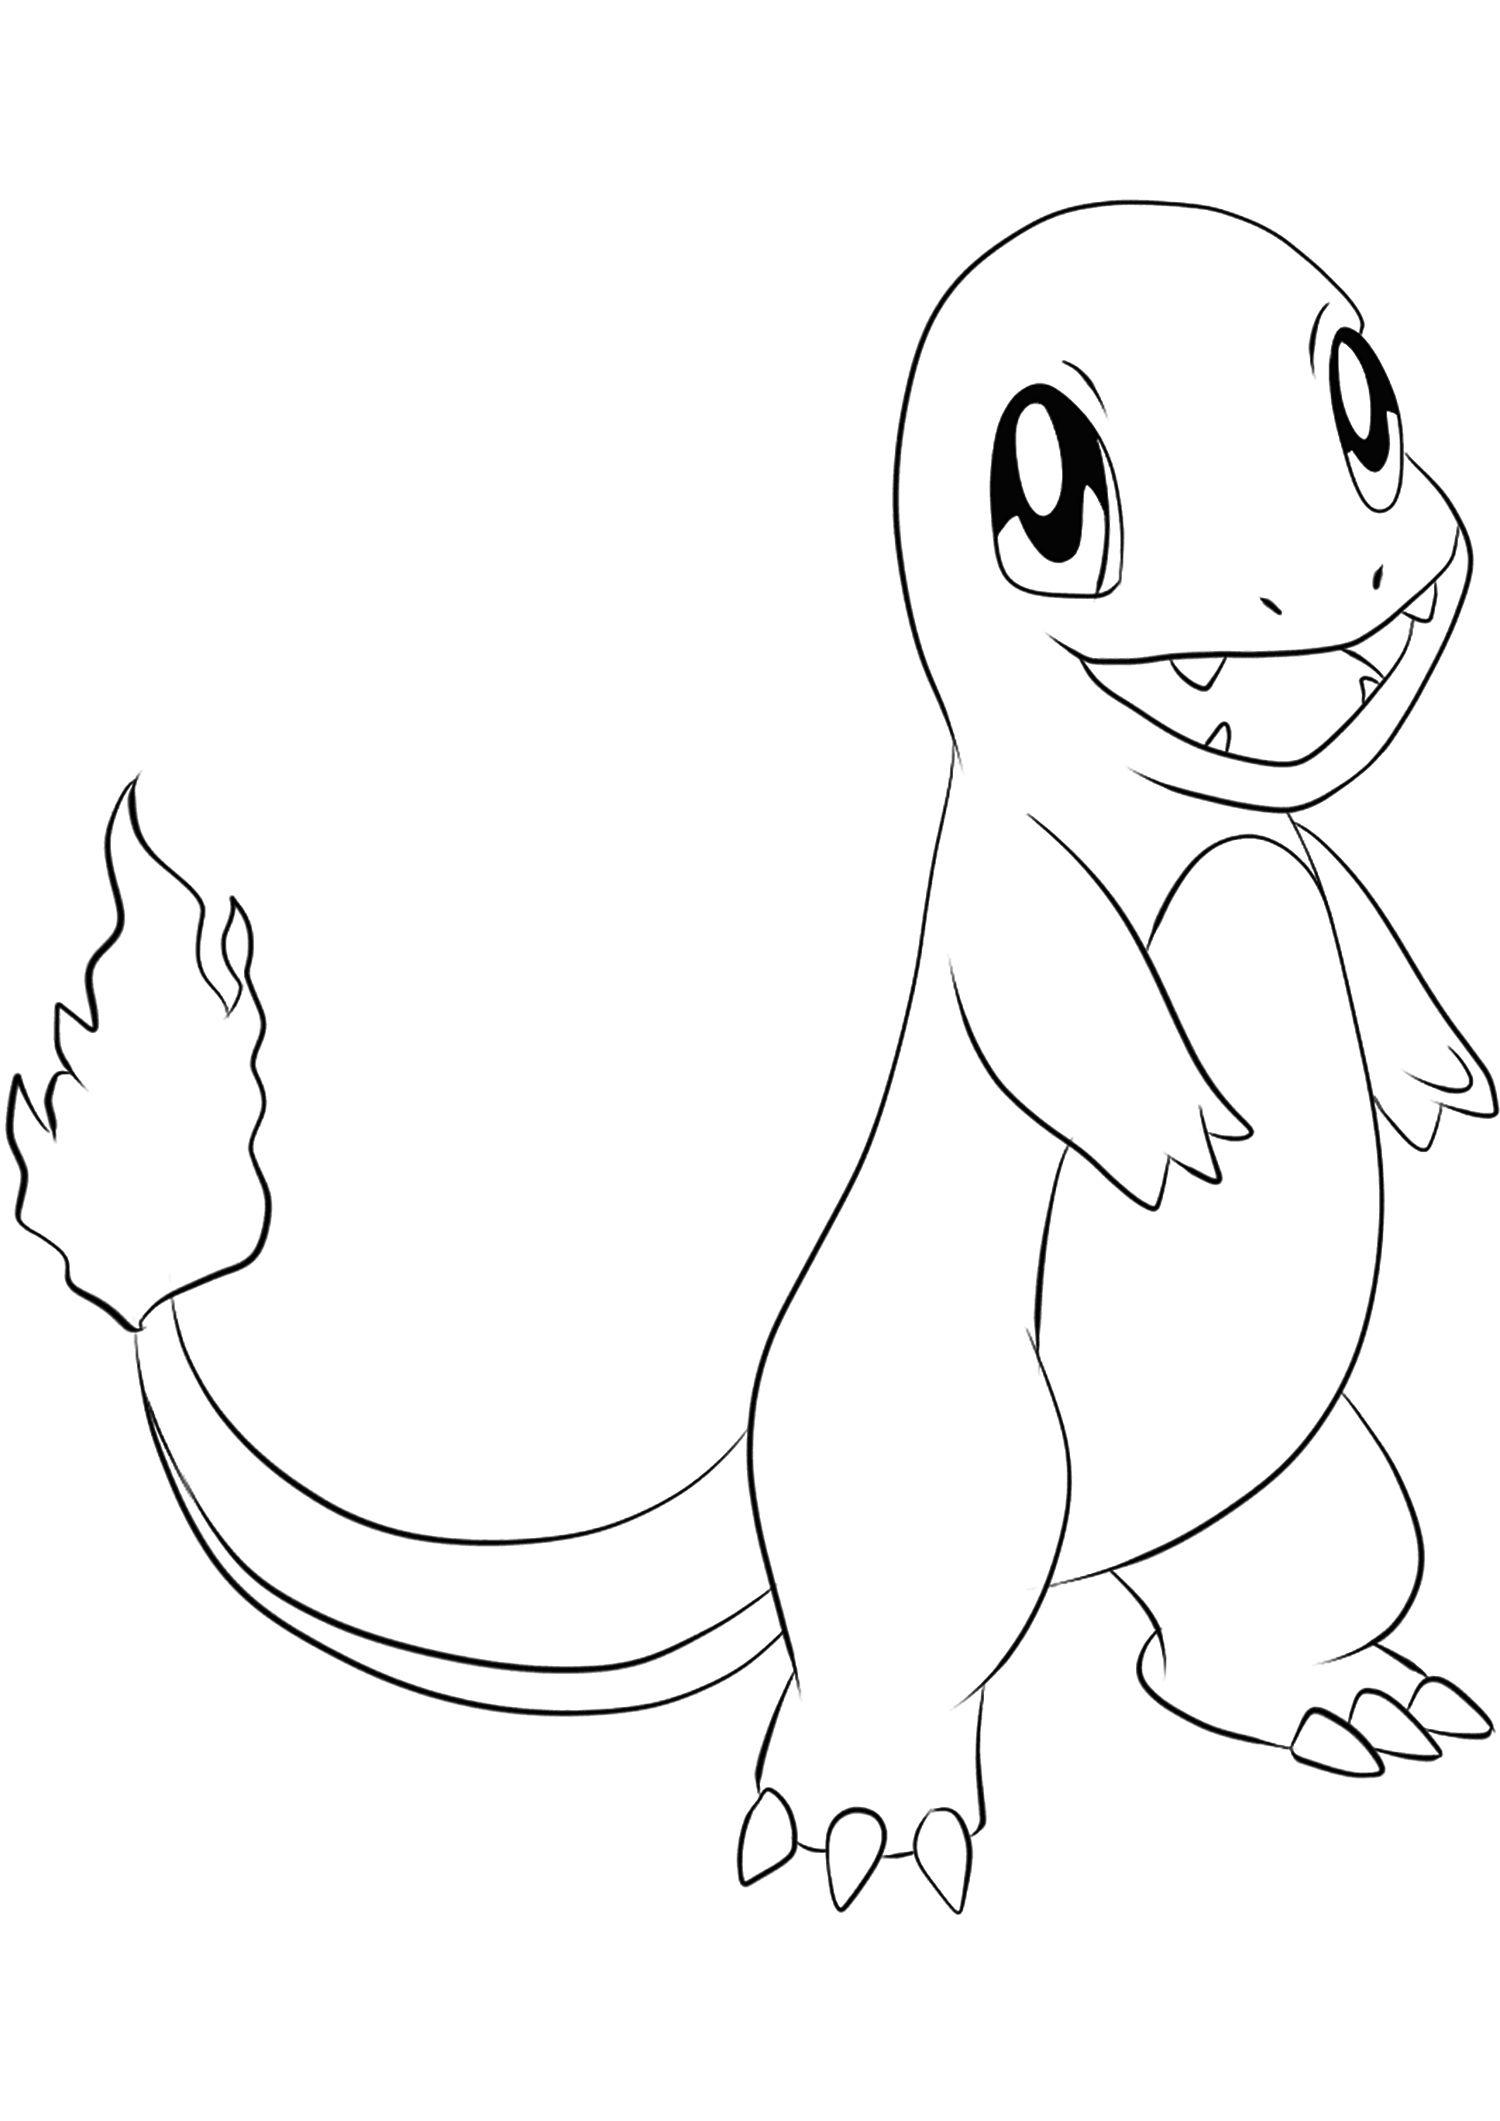 25 Excellent Picture Of Charmander Coloring Page Entitlementtrap Com In 2020 Pokemon Coloring Pokemon Coloring Pages Coloring Pages